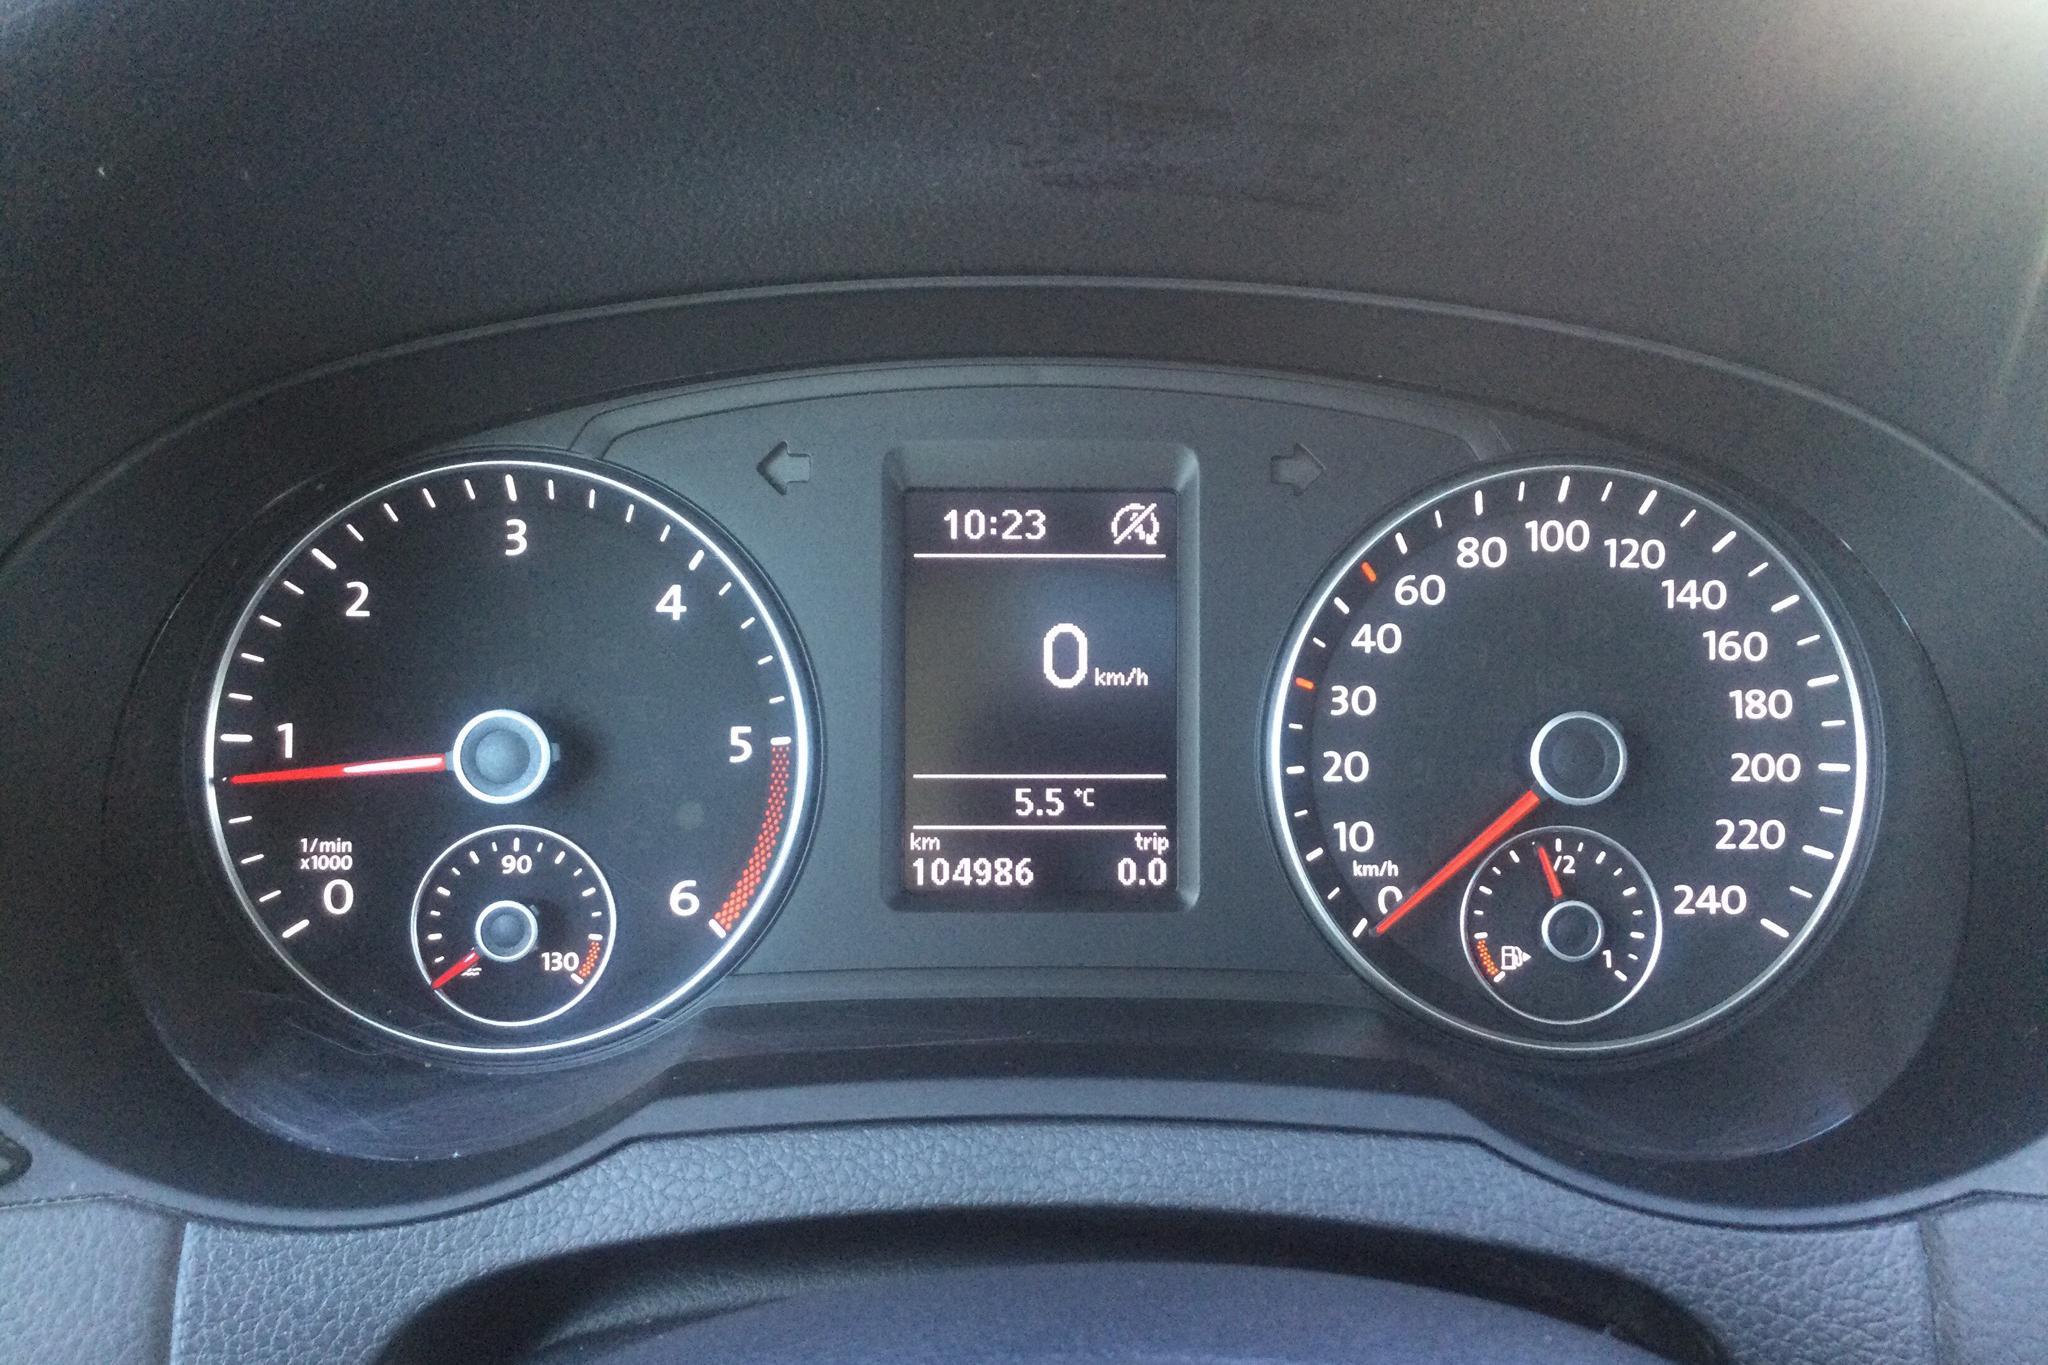 VW Sharan 2.0 TDI 4Motion (150hk) - 104 980 km - Manual - white - 2018